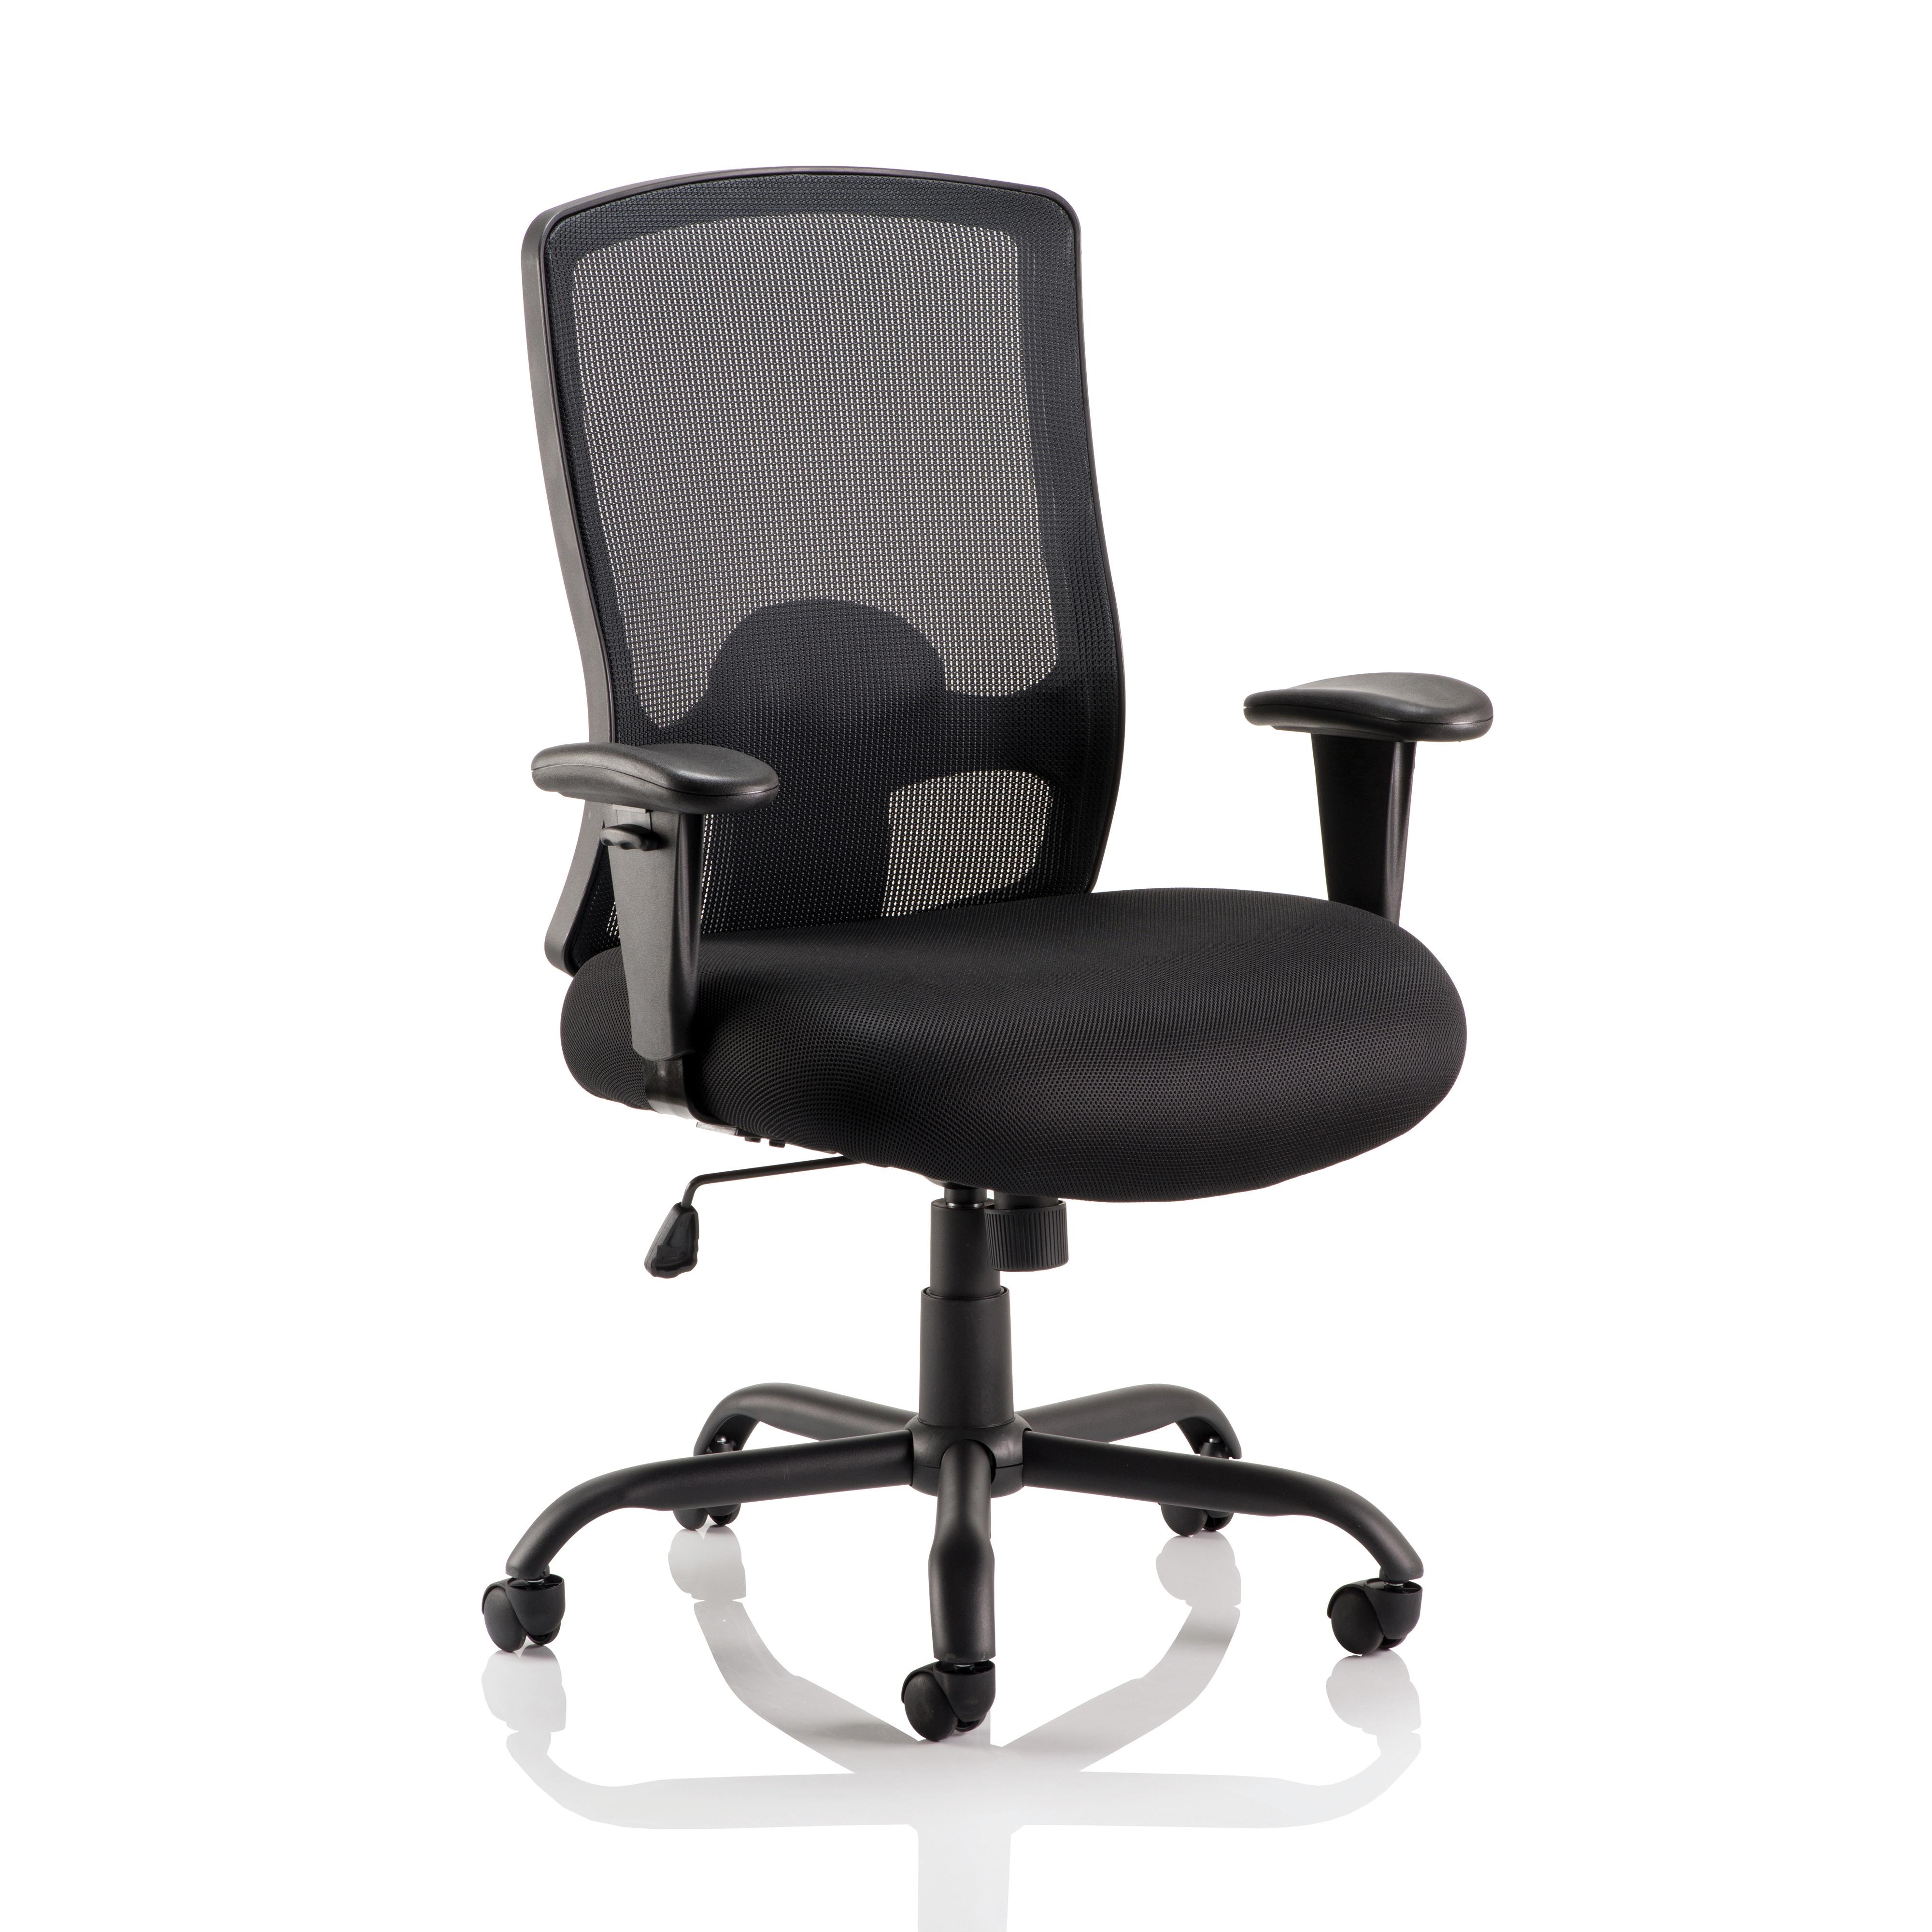 Sonix Portland Heavy Duty Mesh Chair Black 610x540x490-590mm Ref OP000106